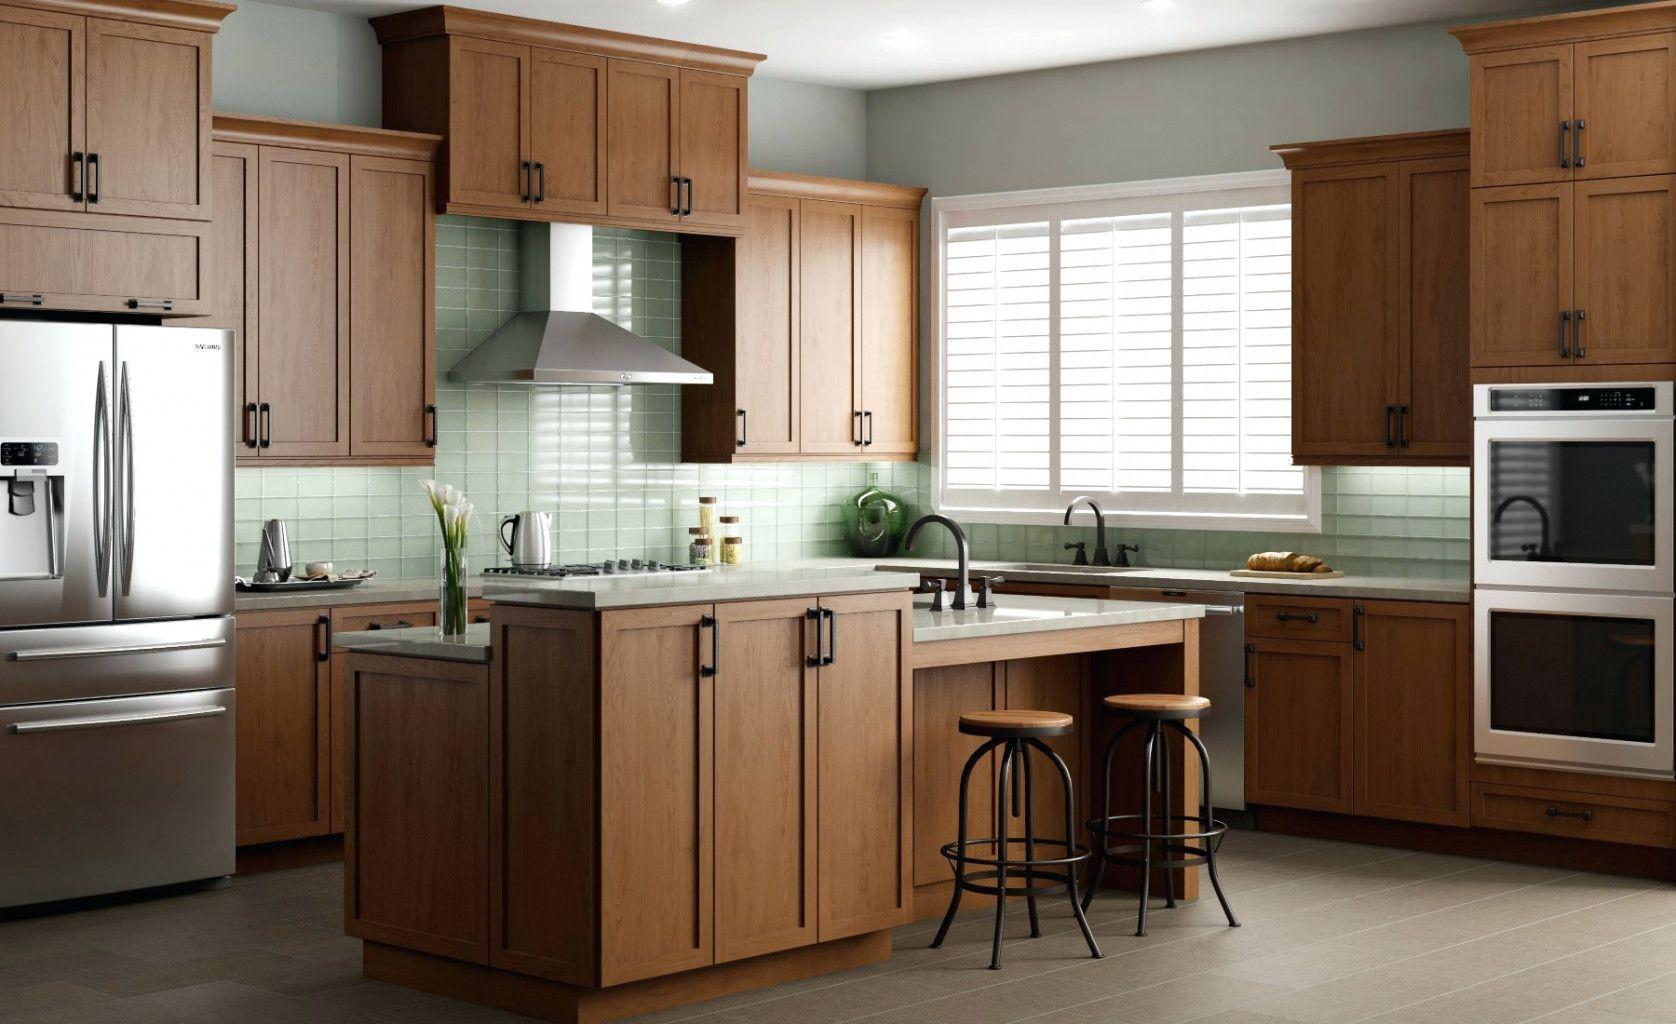 2018 kitchen cabinets peoria il - kitchen island countertop ideas